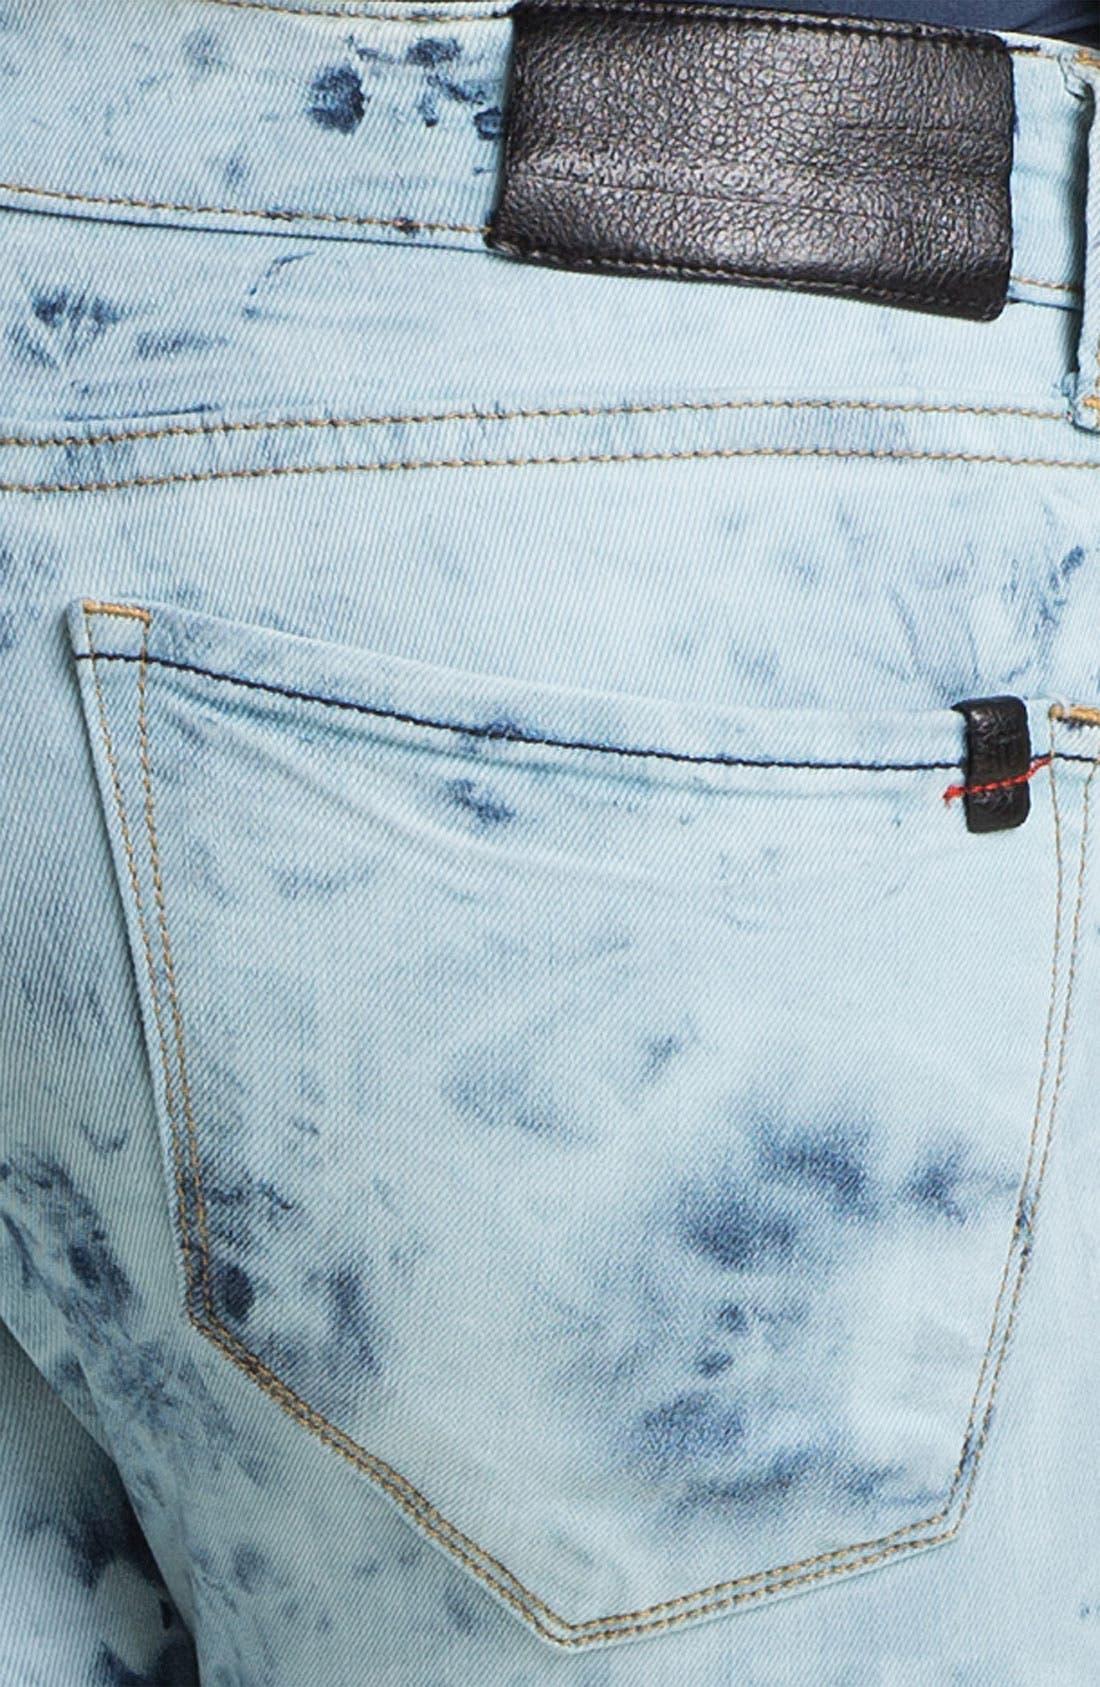 Alternate Image 3  - !iT Collective Tie Dye Skinny Jeans (Activist) (Online Exclusive)